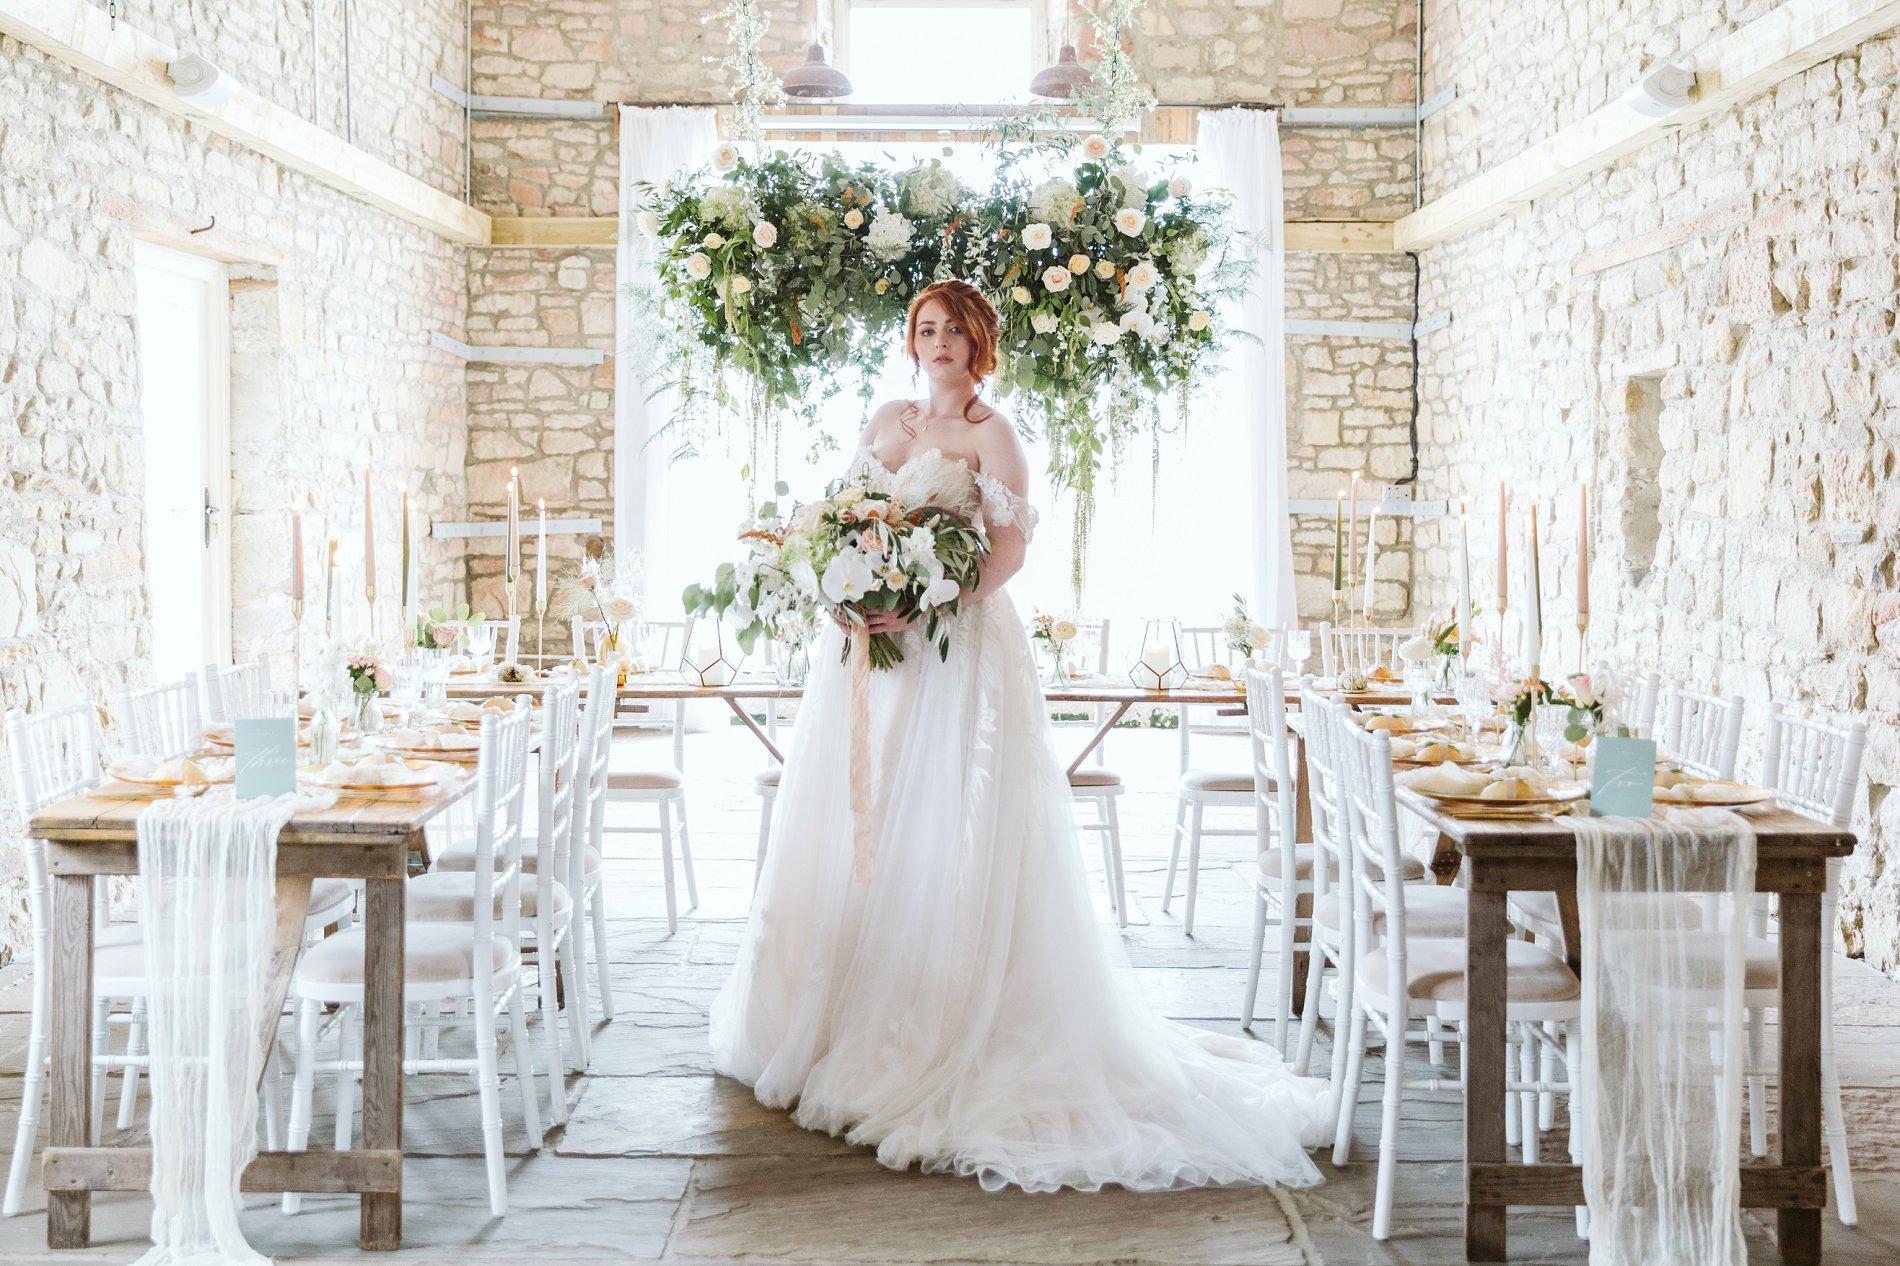 Saying I Do Rustic Wedding Creative Shoot (c) Charlotte Eve Photography (27)